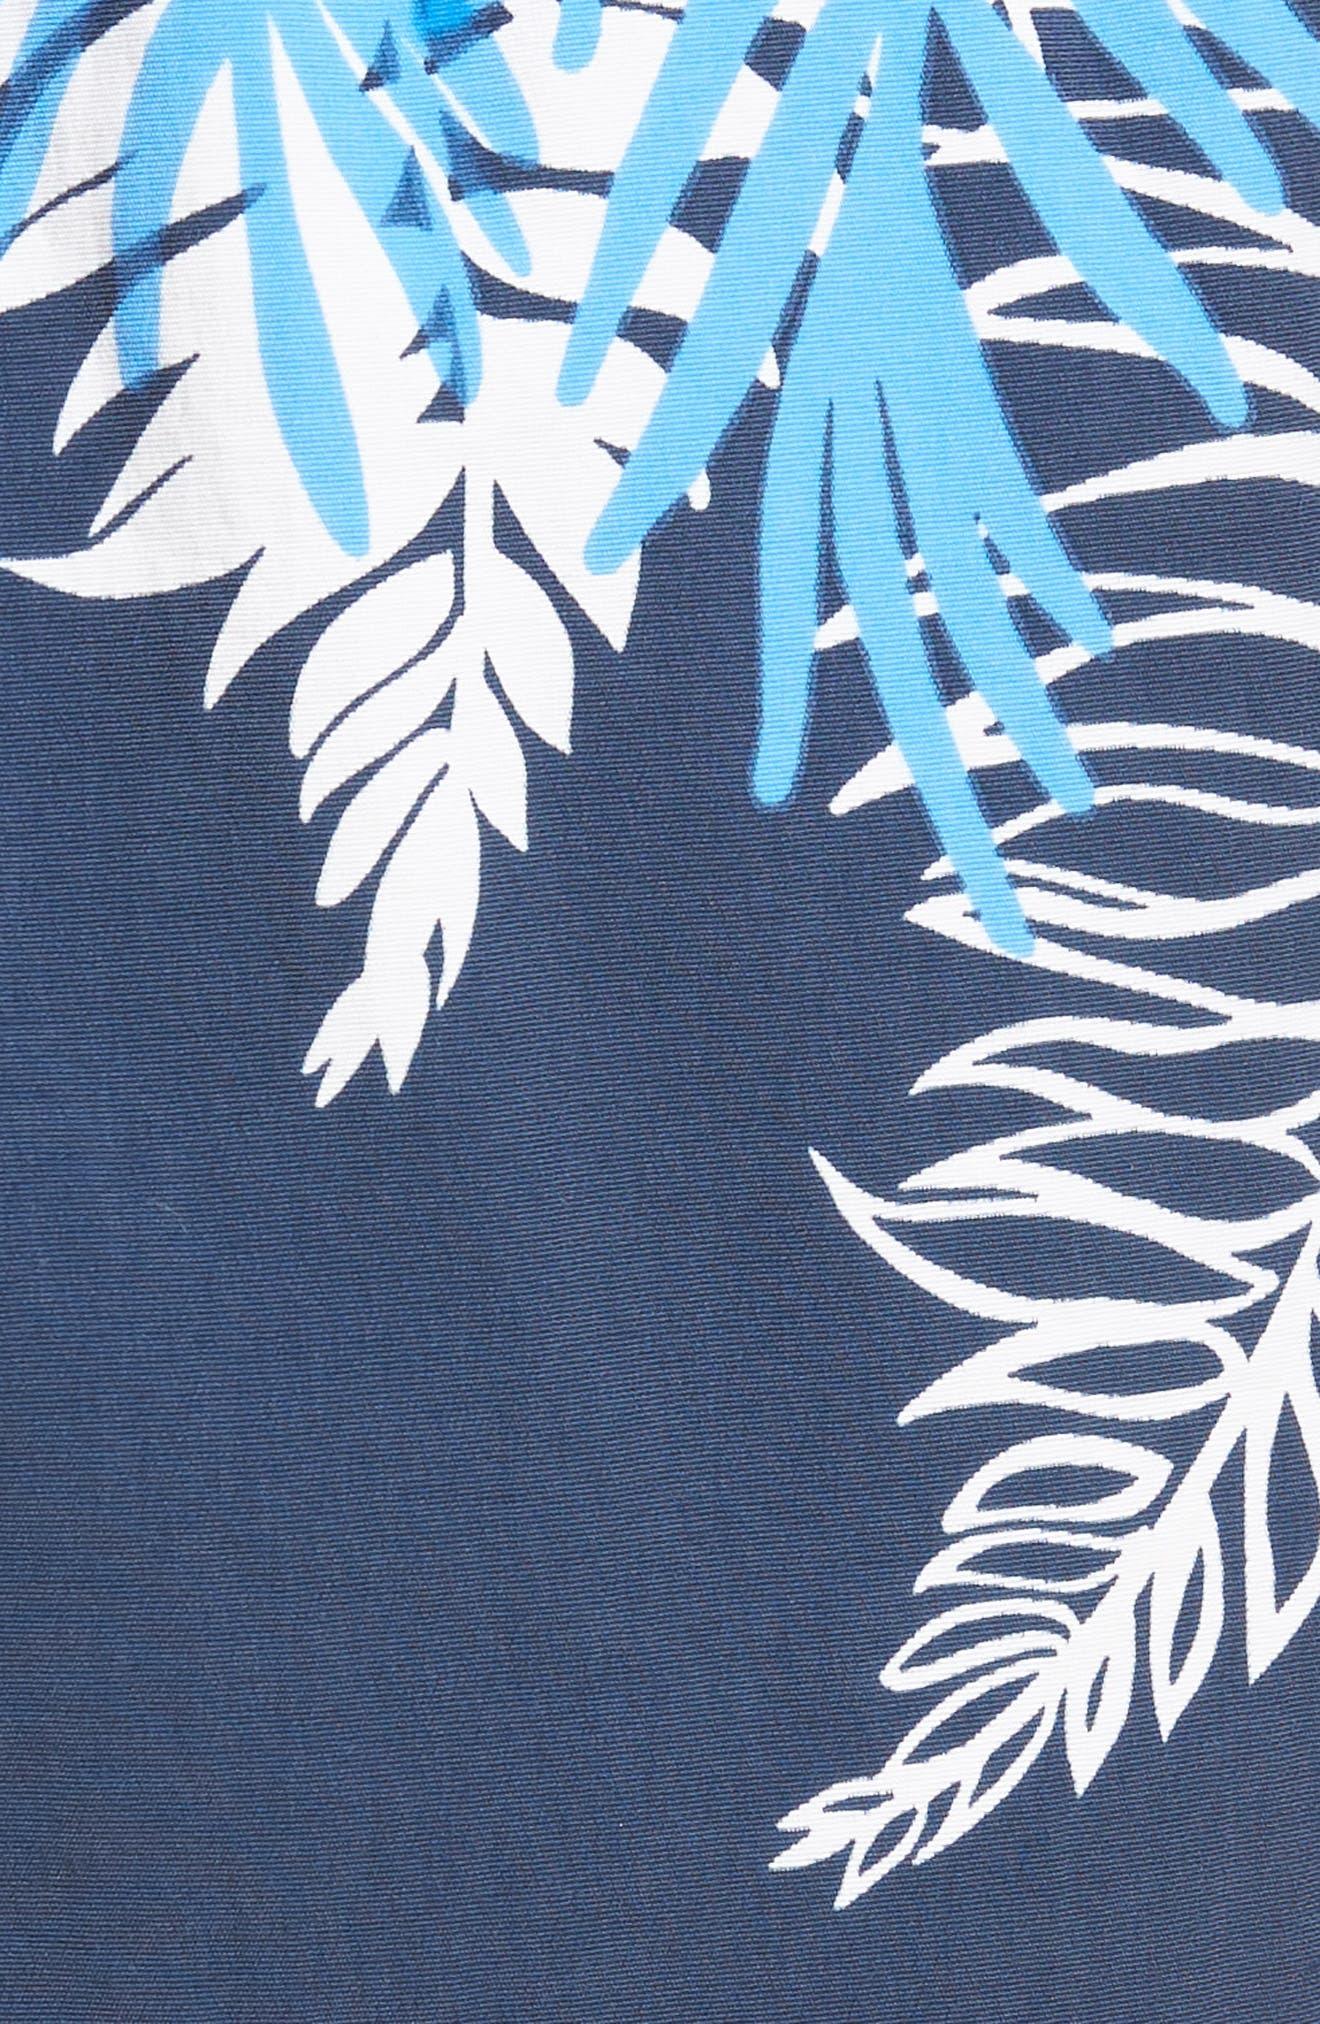 Naples Hacienda Board Shorts,                             Alternate thumbnail 5, color,                             400